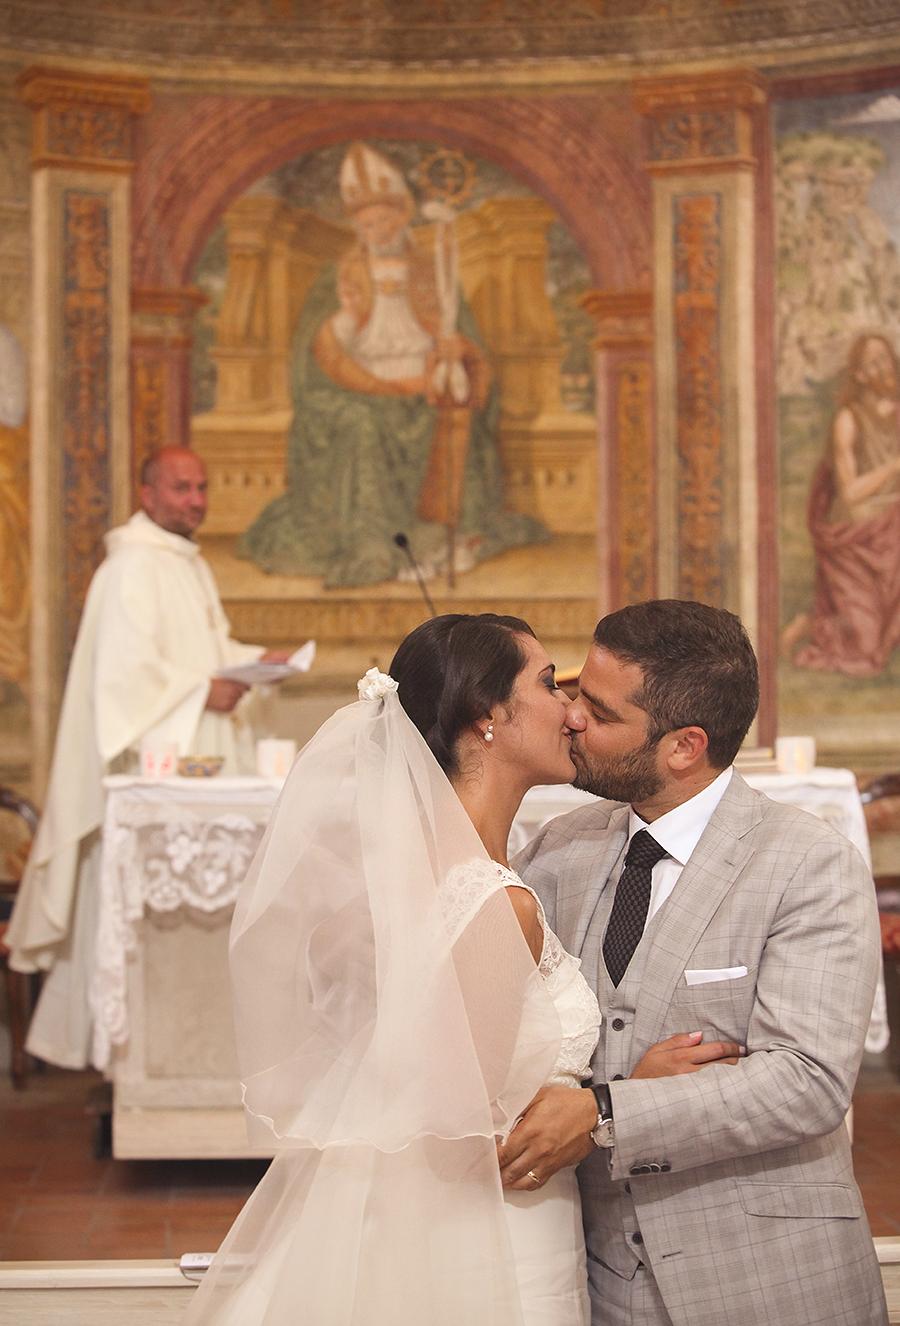 italy wedding photography by kurt ahs . alex + silvia ( washington united states ) . 7359.jpg